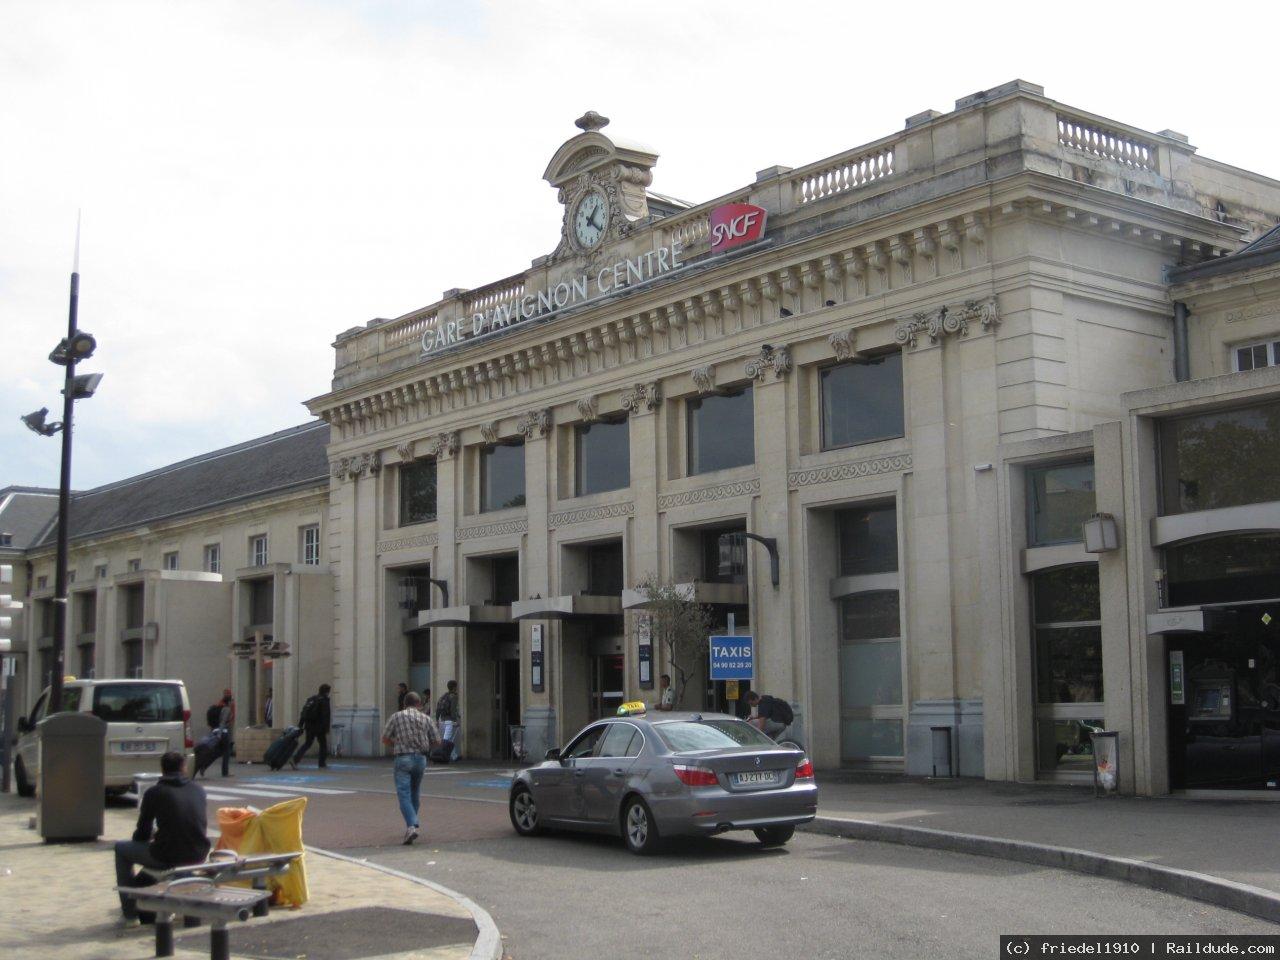 Avignon Centre Railway Station | railcc